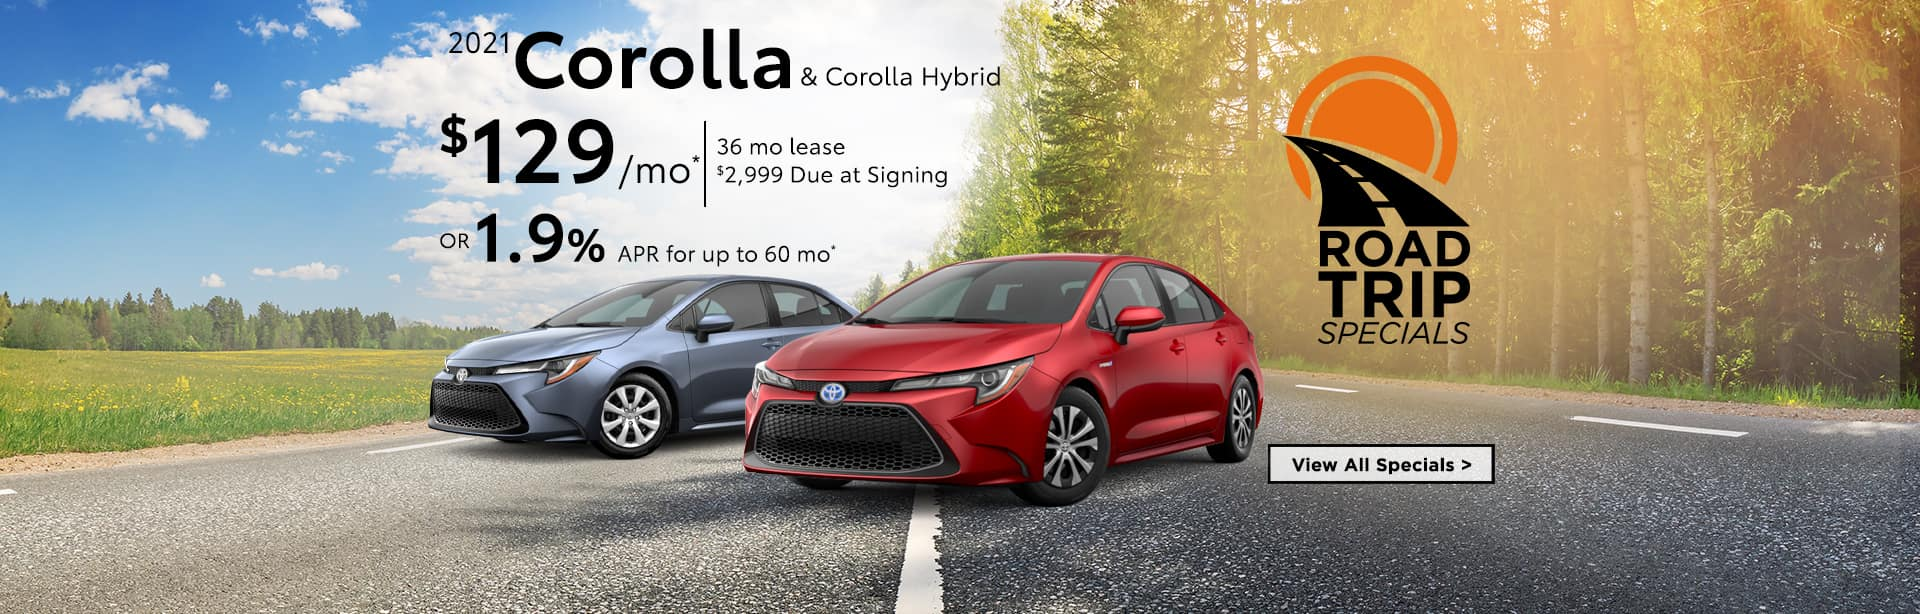 May21-HT-Banner-Corolla-Hybrid